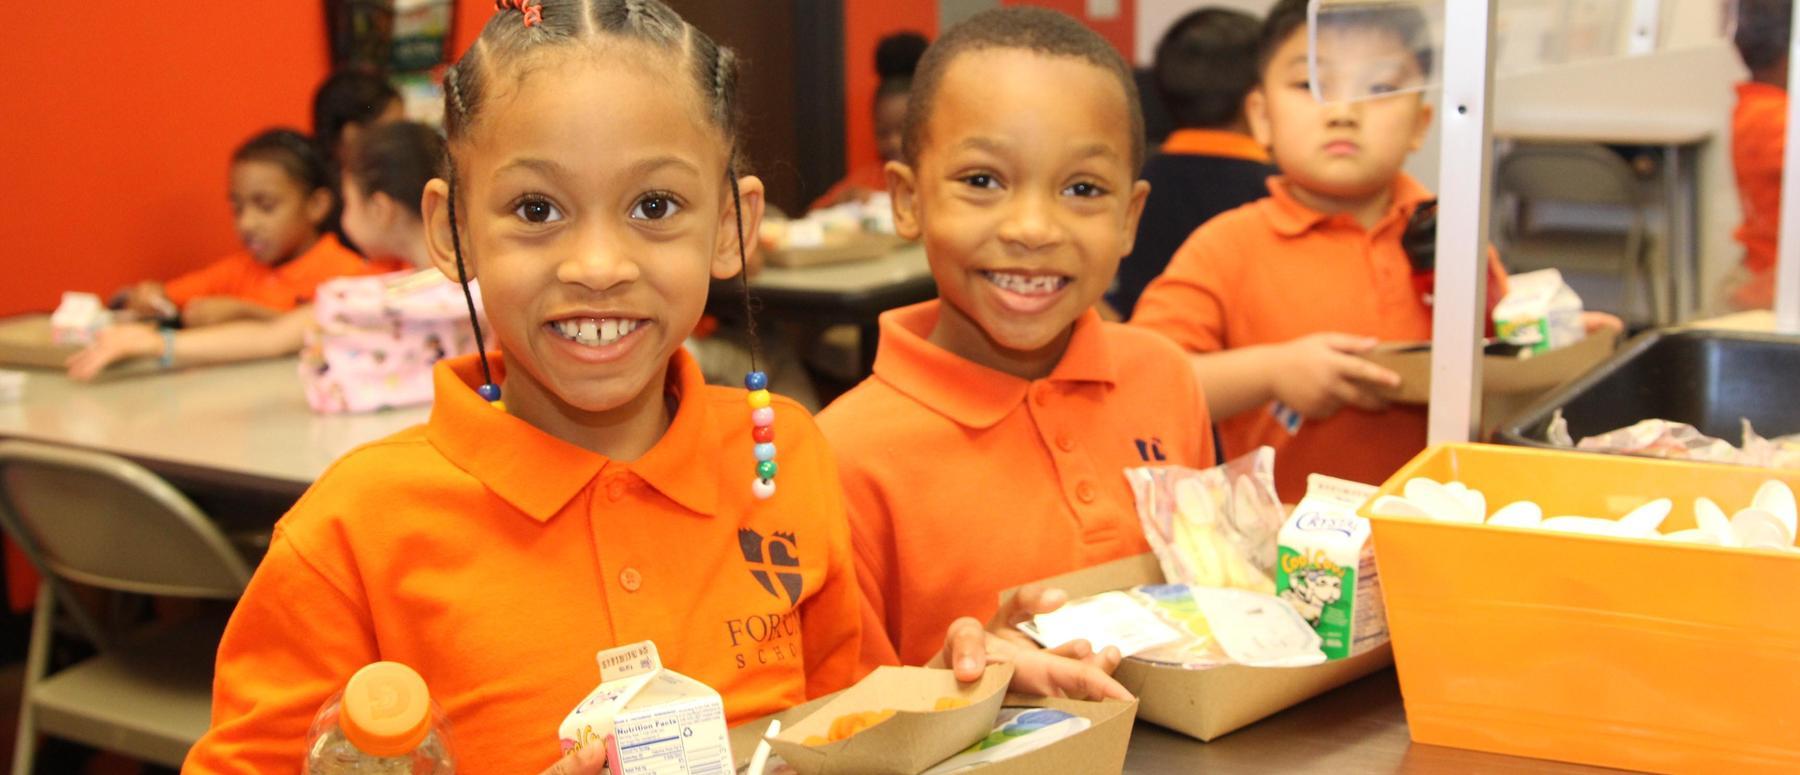 Fortune scholars in the school lunch line